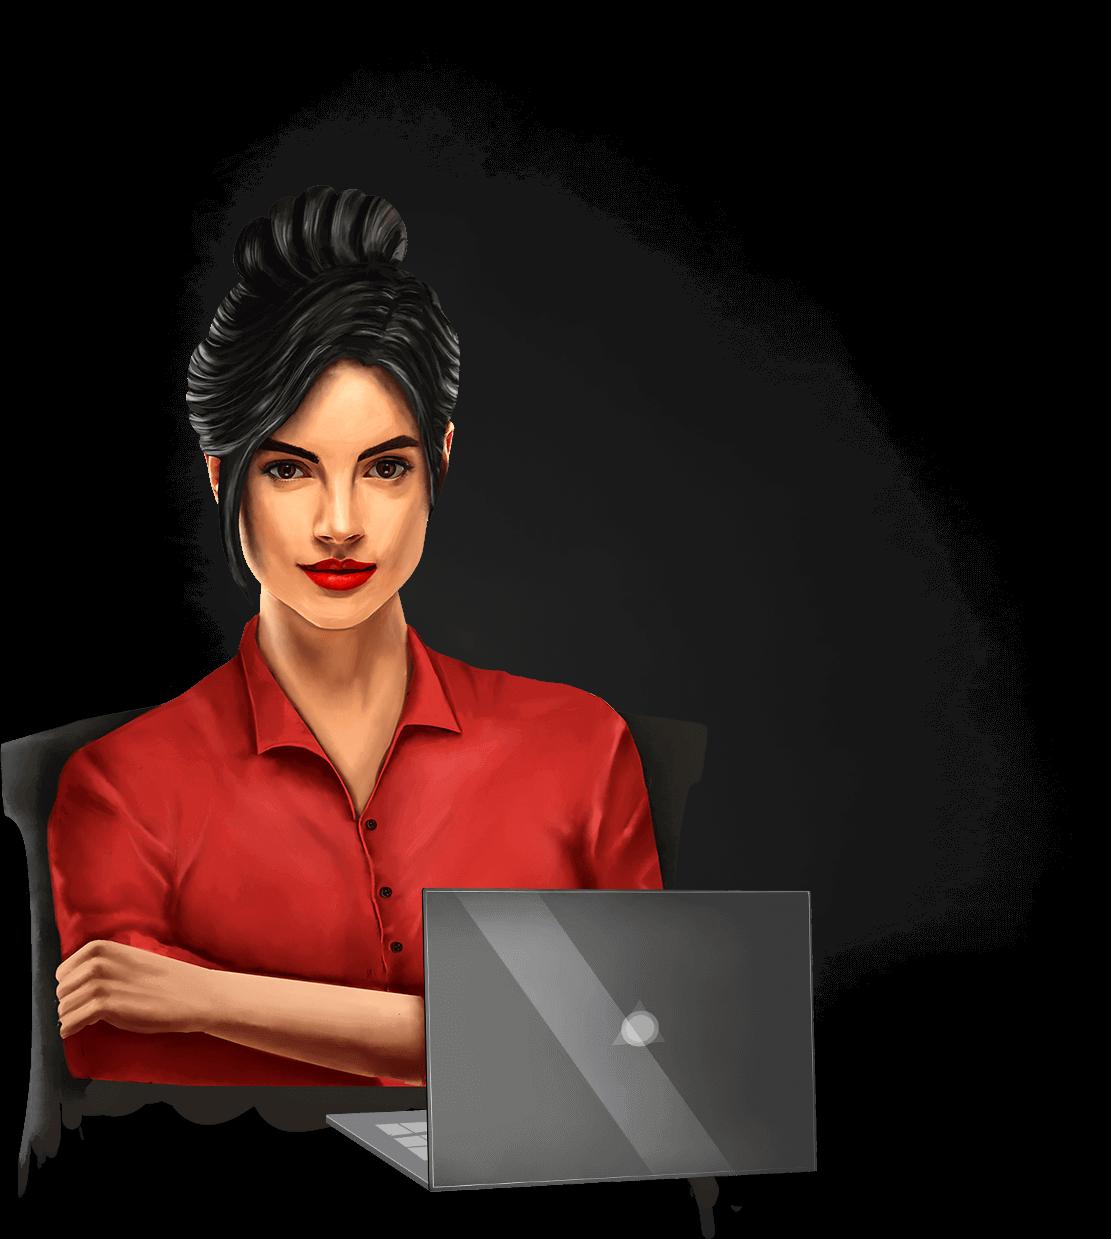 Ira-Virtual counsellor